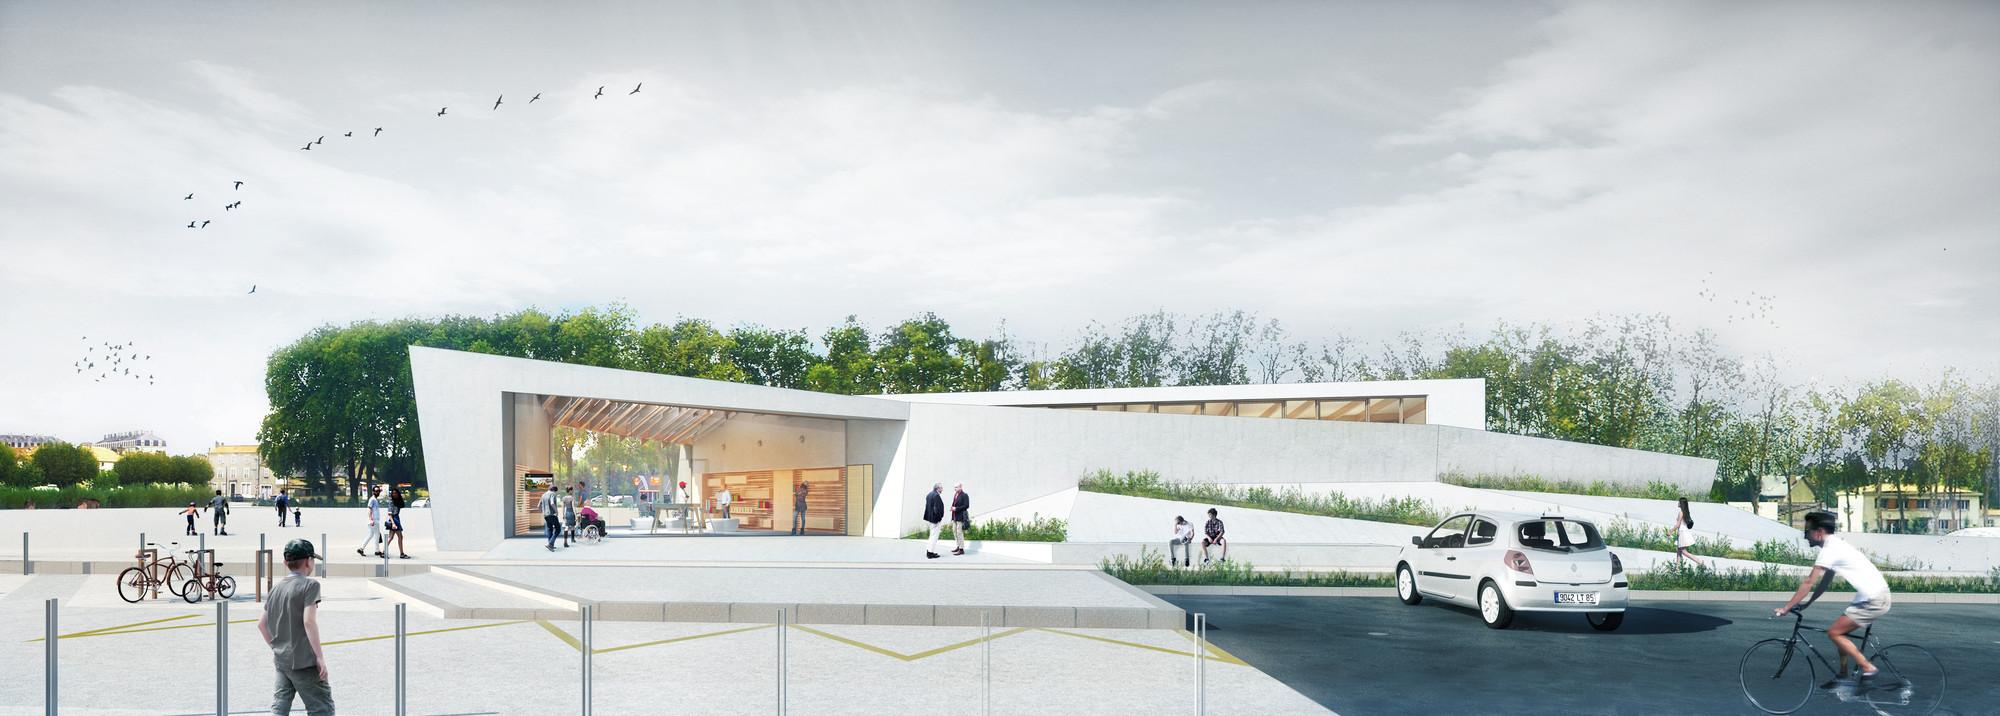 Thibaudeau Architecte & Agence d'Architecture Guiraud-Manenc Design Sculptural Tourism Office in France, © Thibaudeau Architecte & Agence d'Architecture Guiraud-Manenc